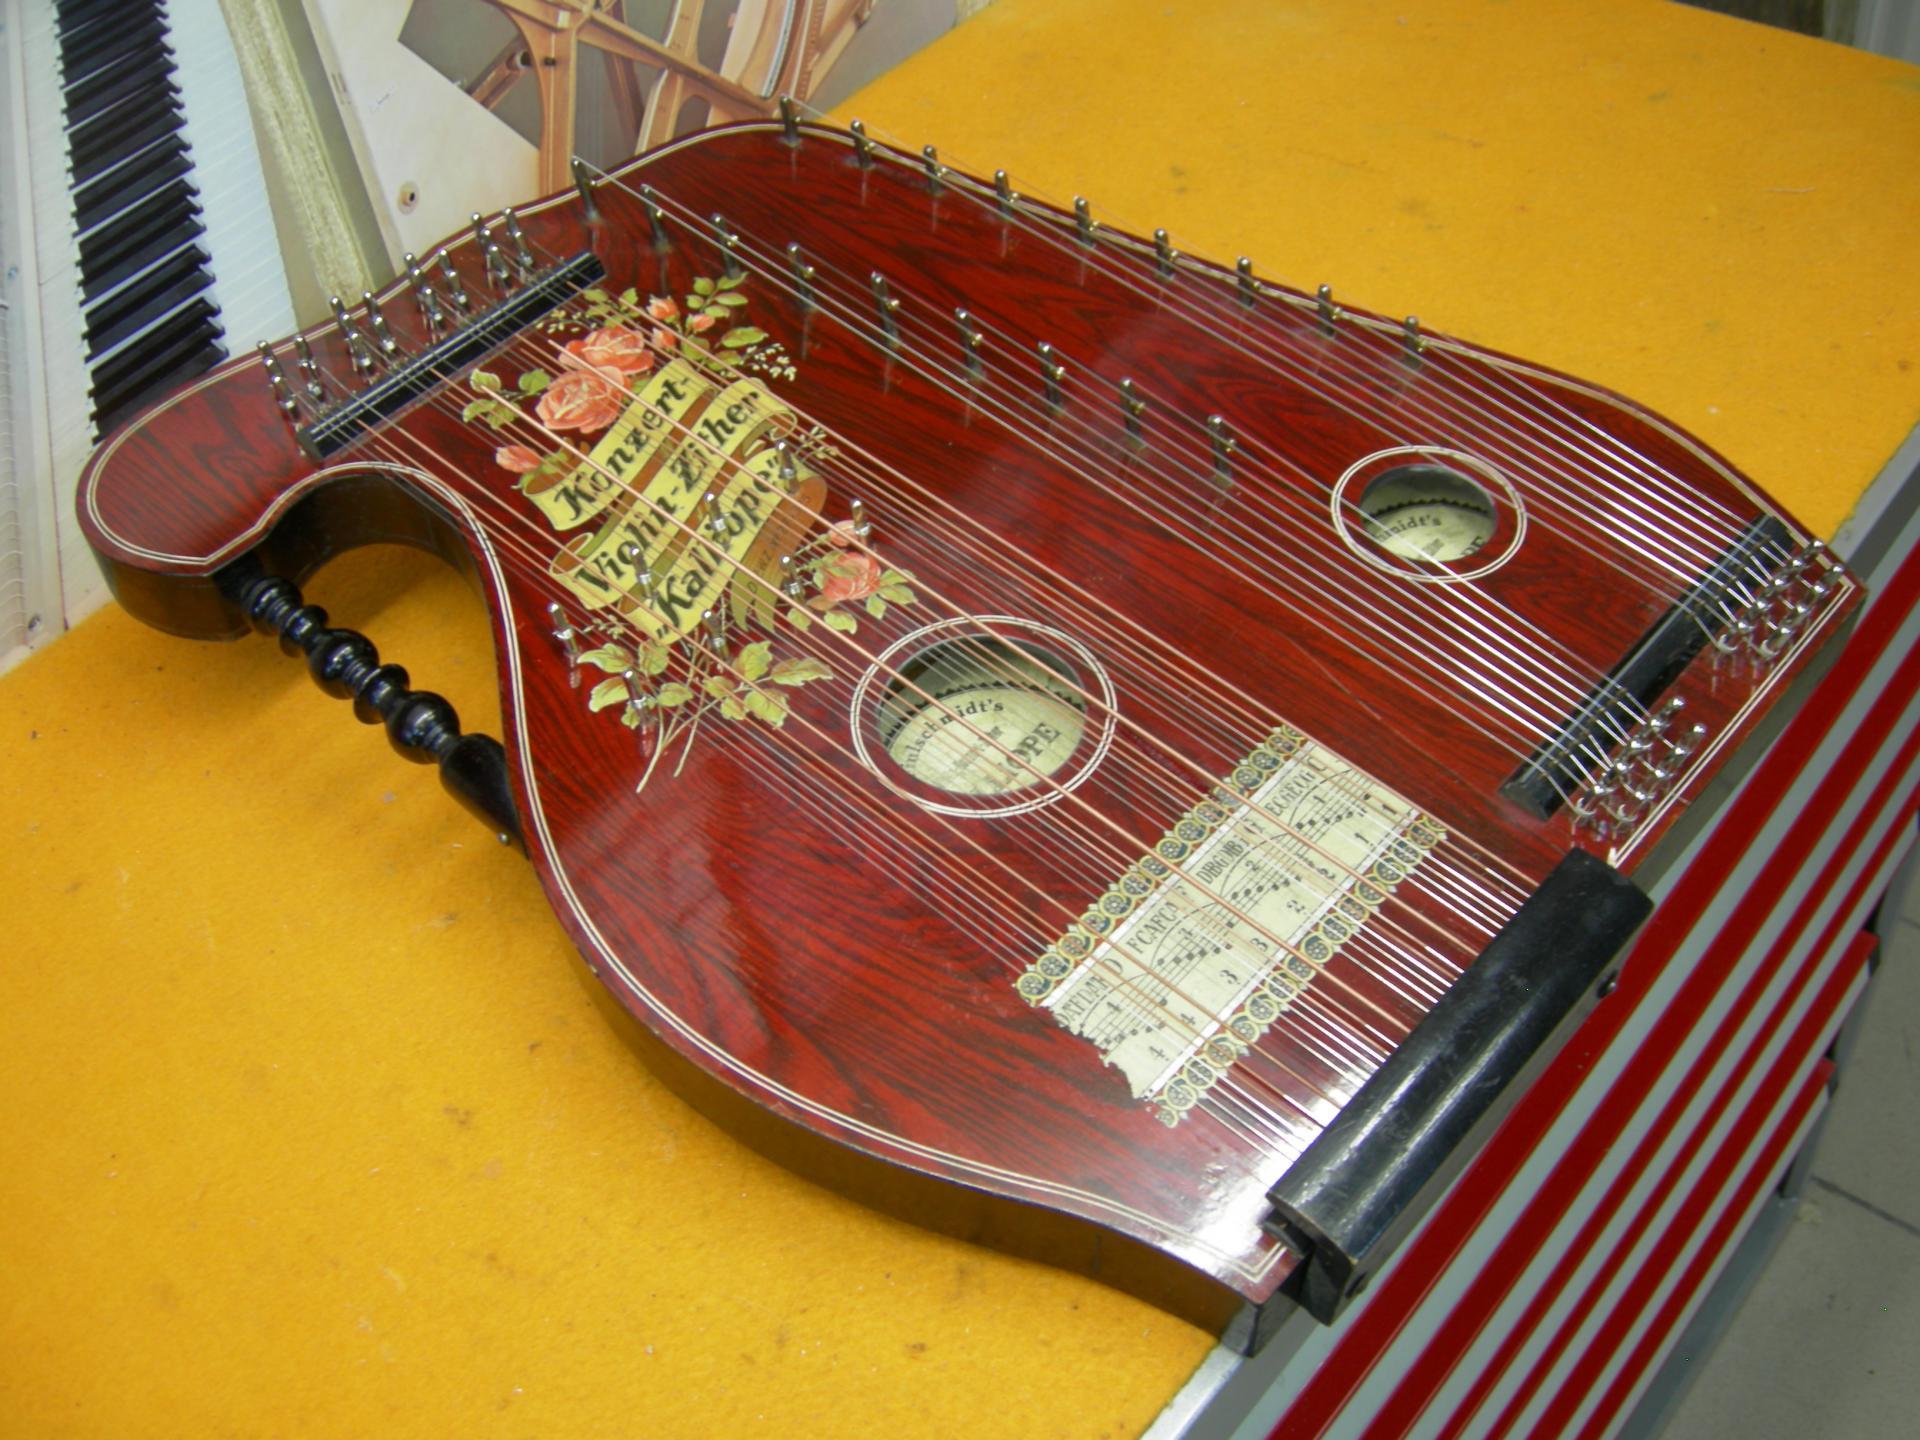 Cithare violon